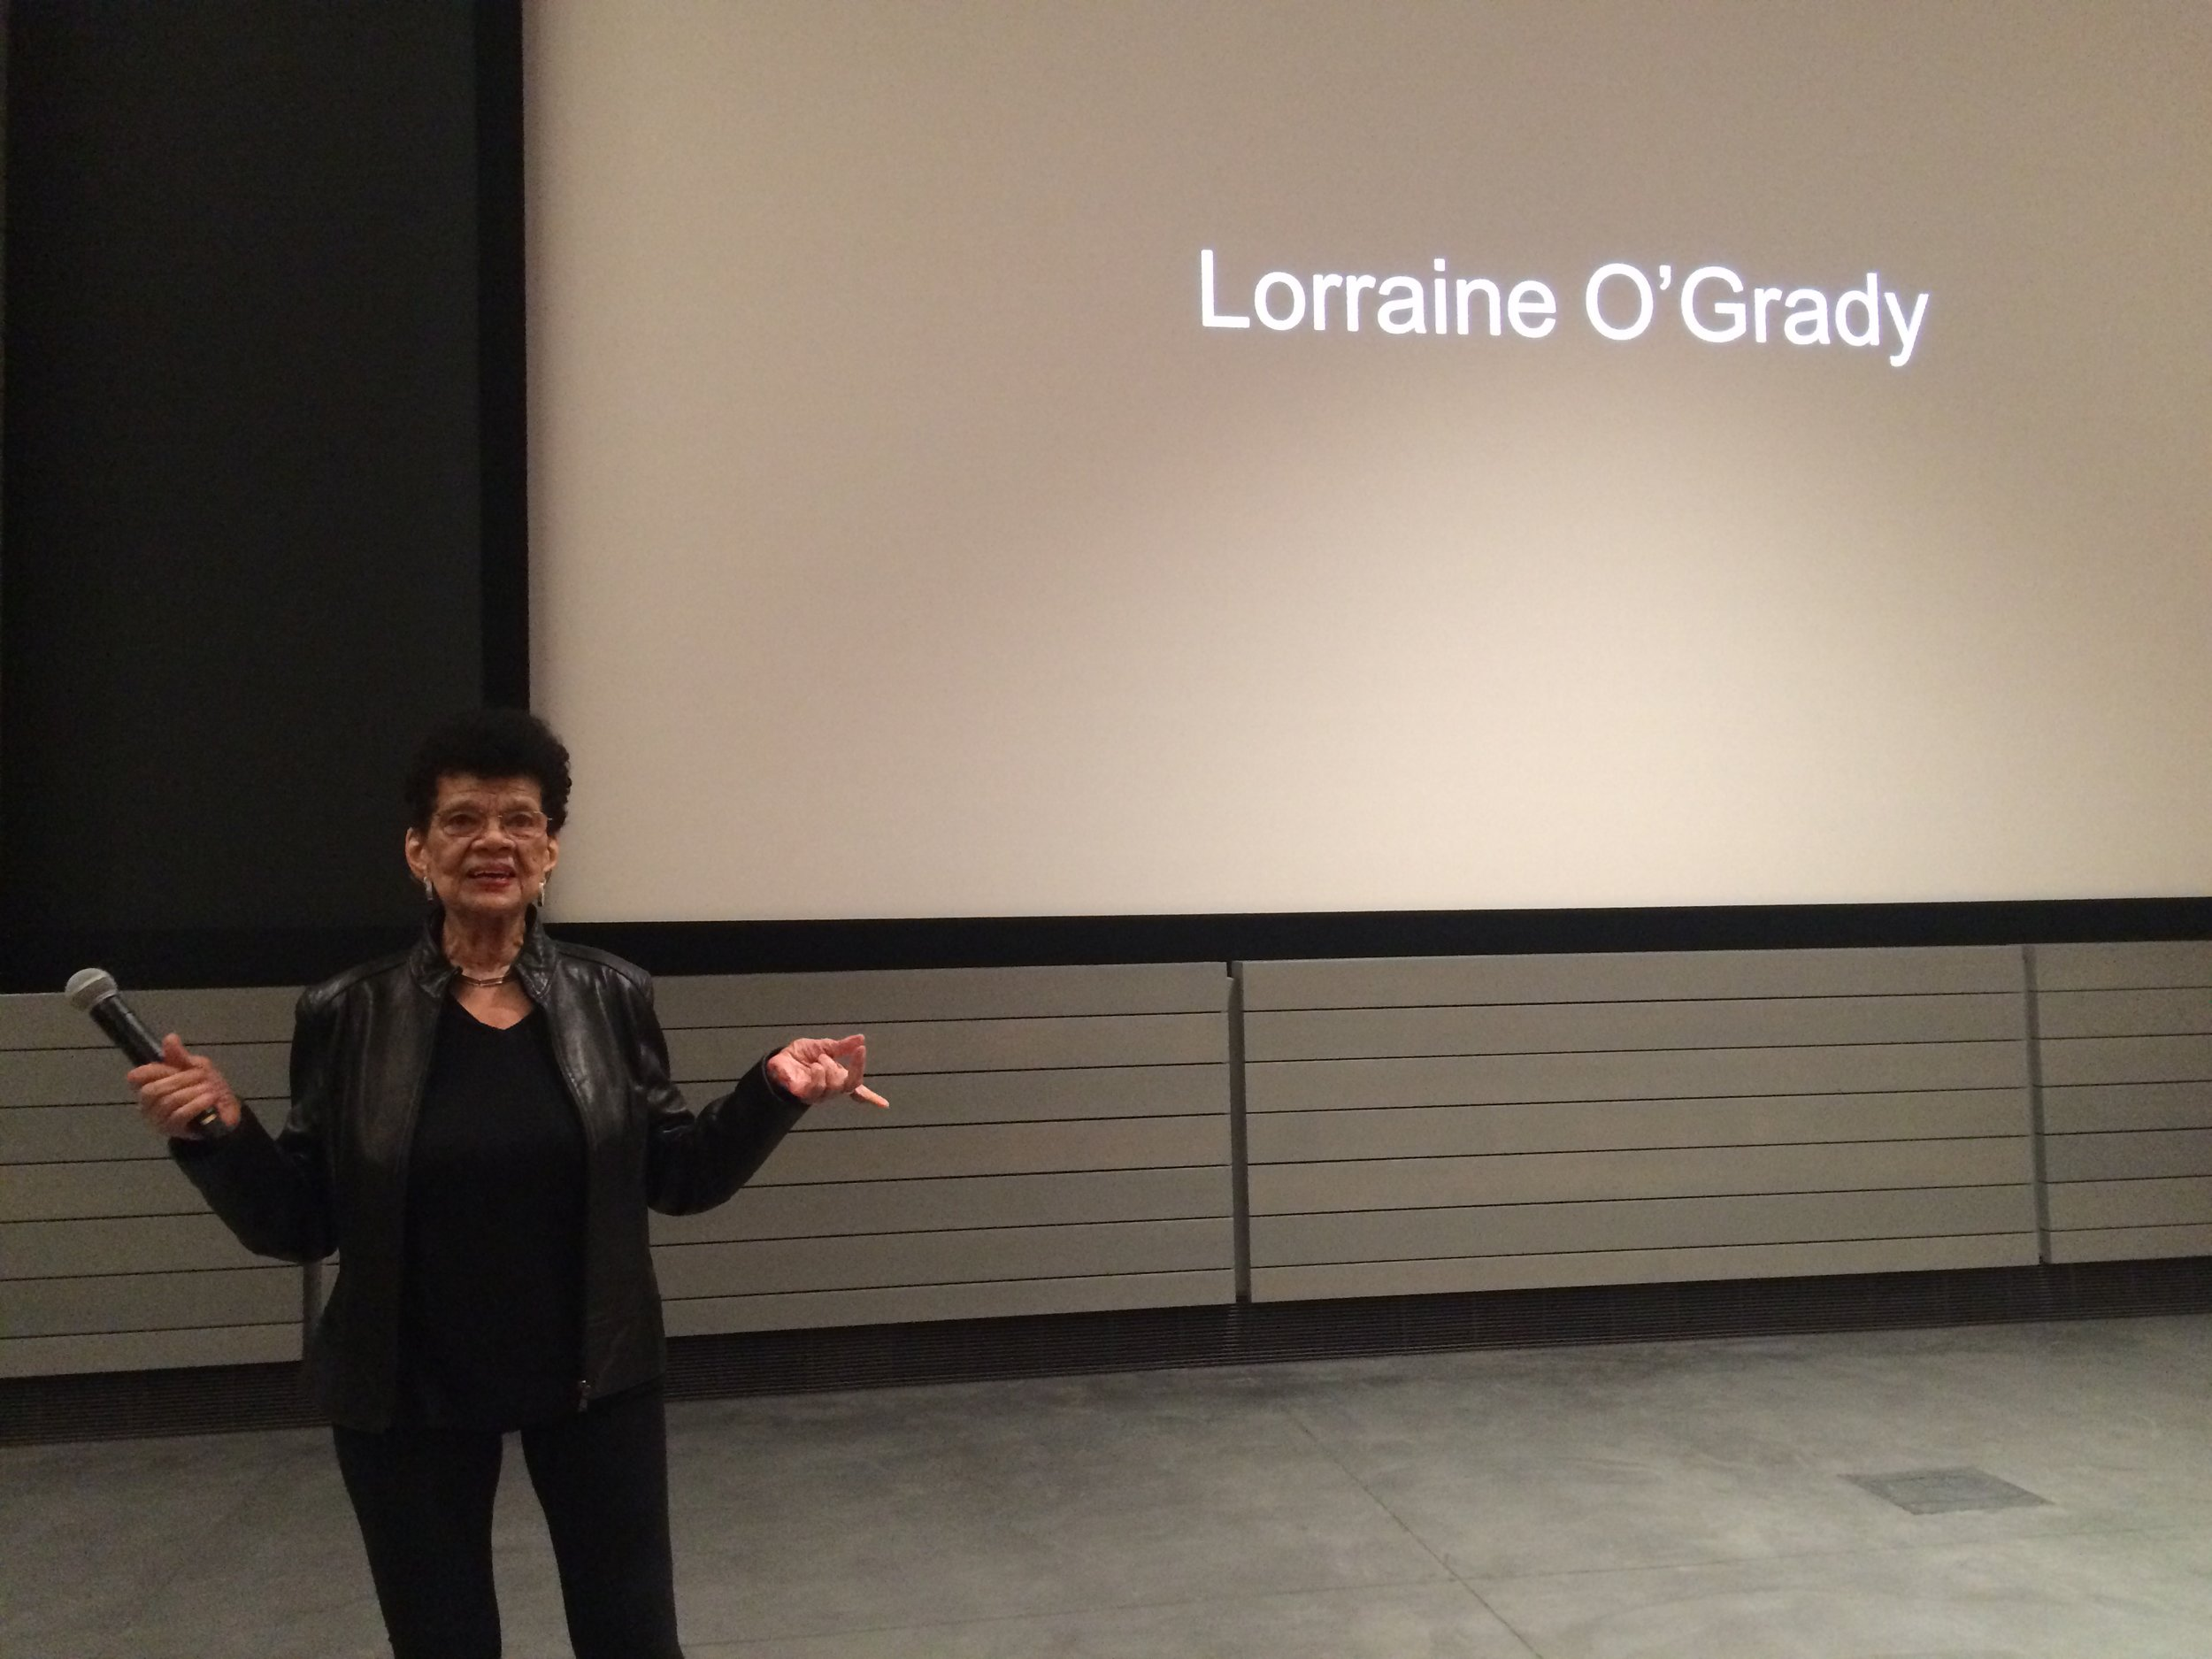 lorraine-ogrady-where-margins-become-centers_22522085554_o.jpg